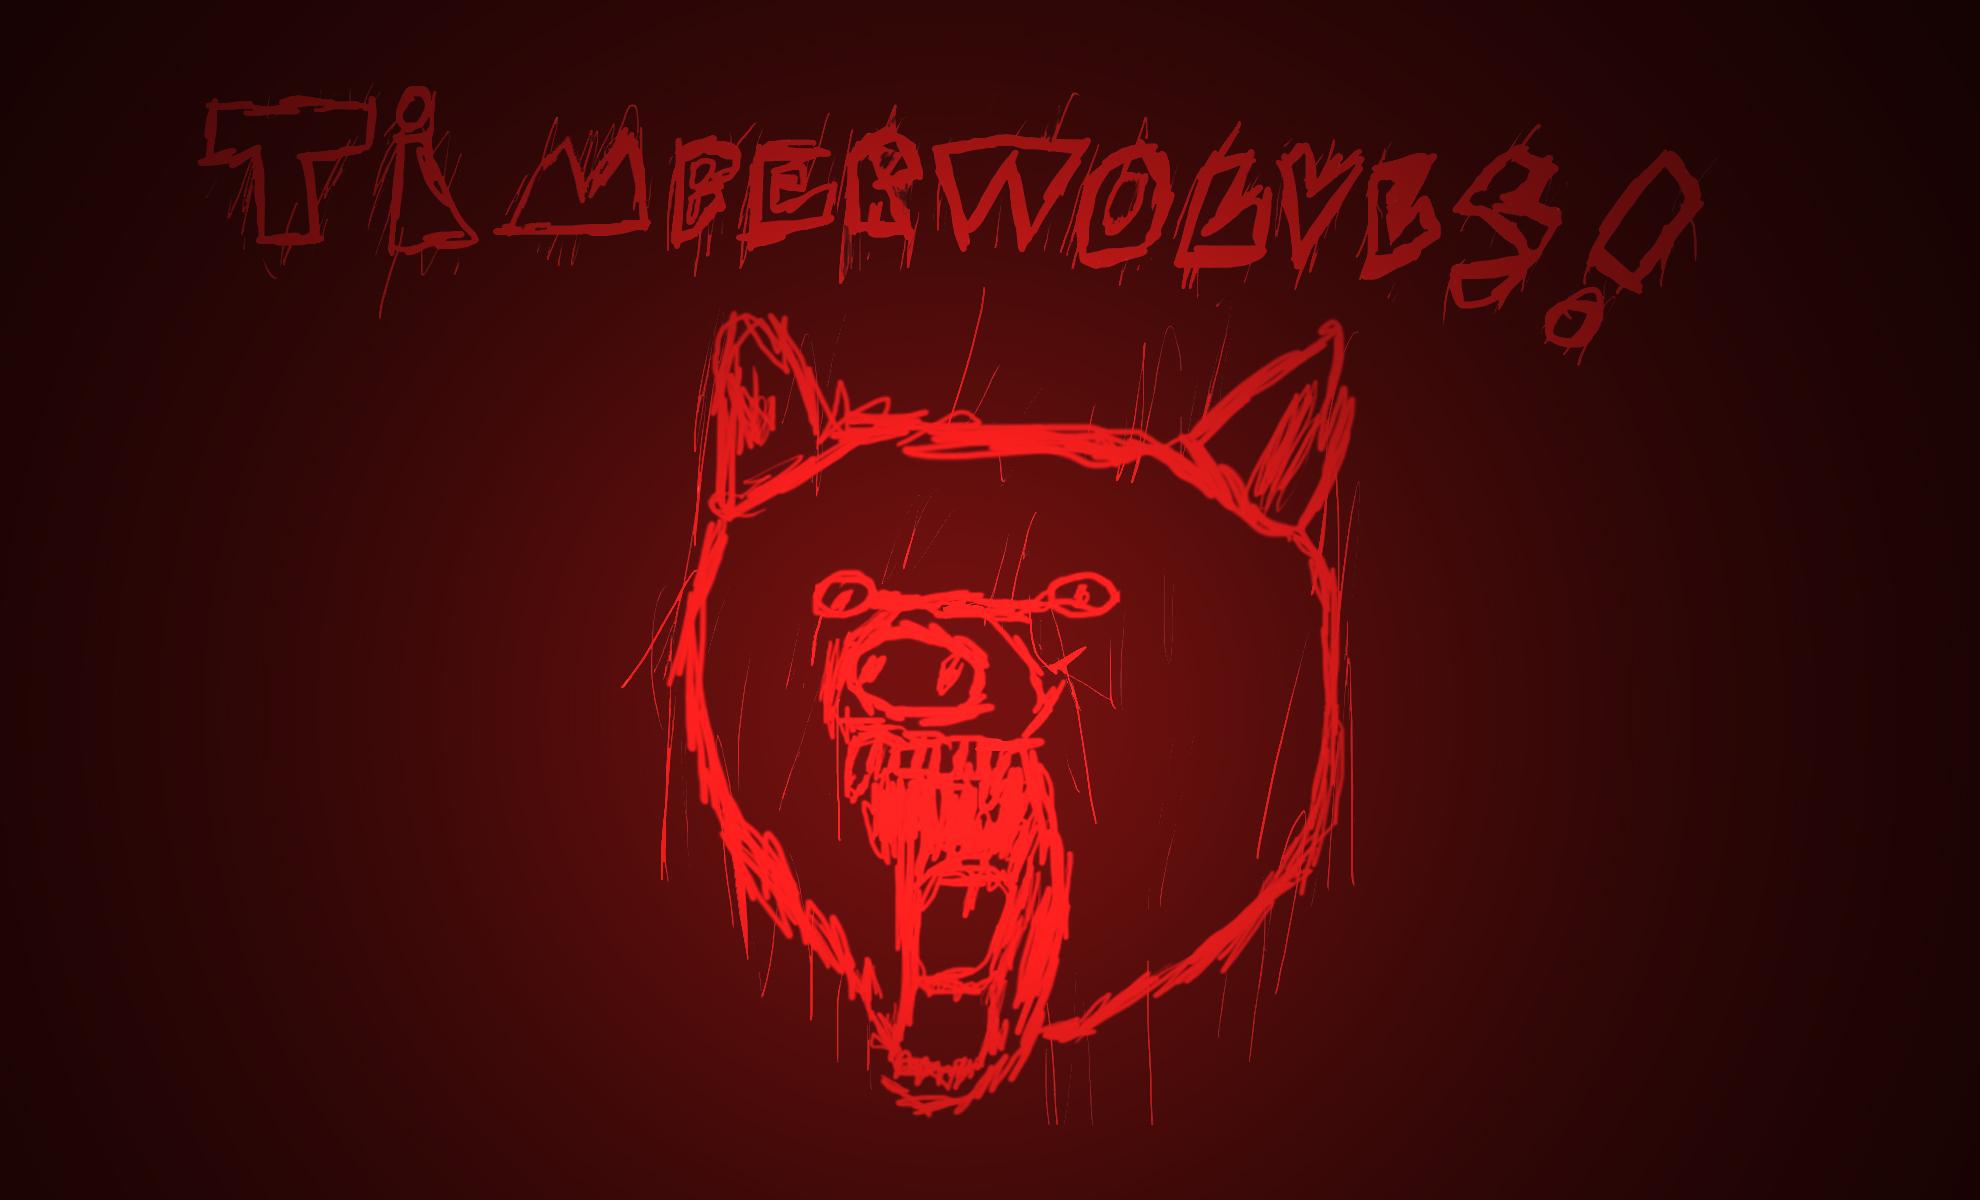 timberwolves wallpaper